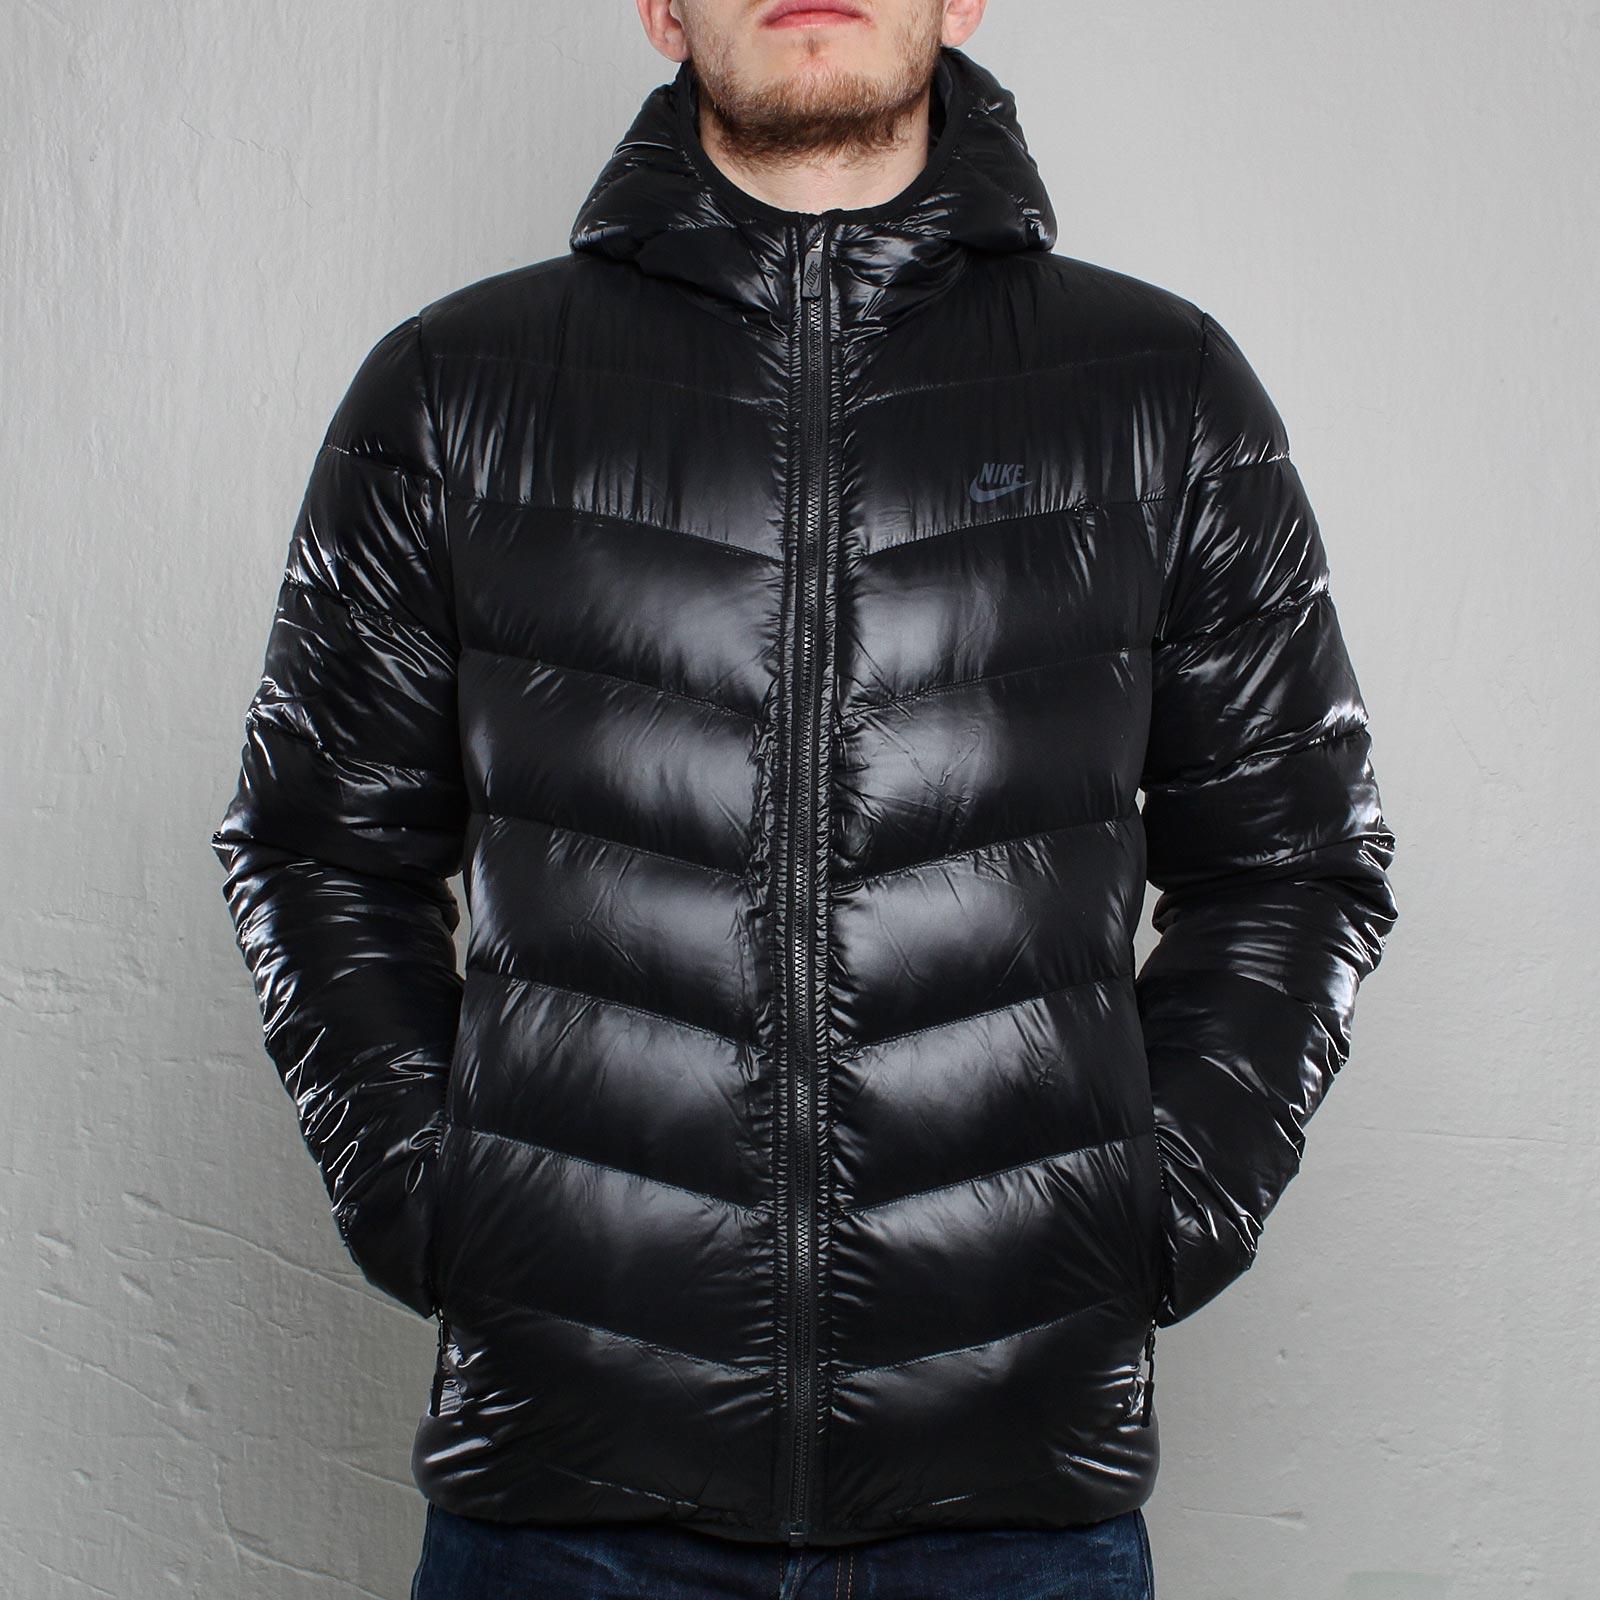 nike cascade down jacket